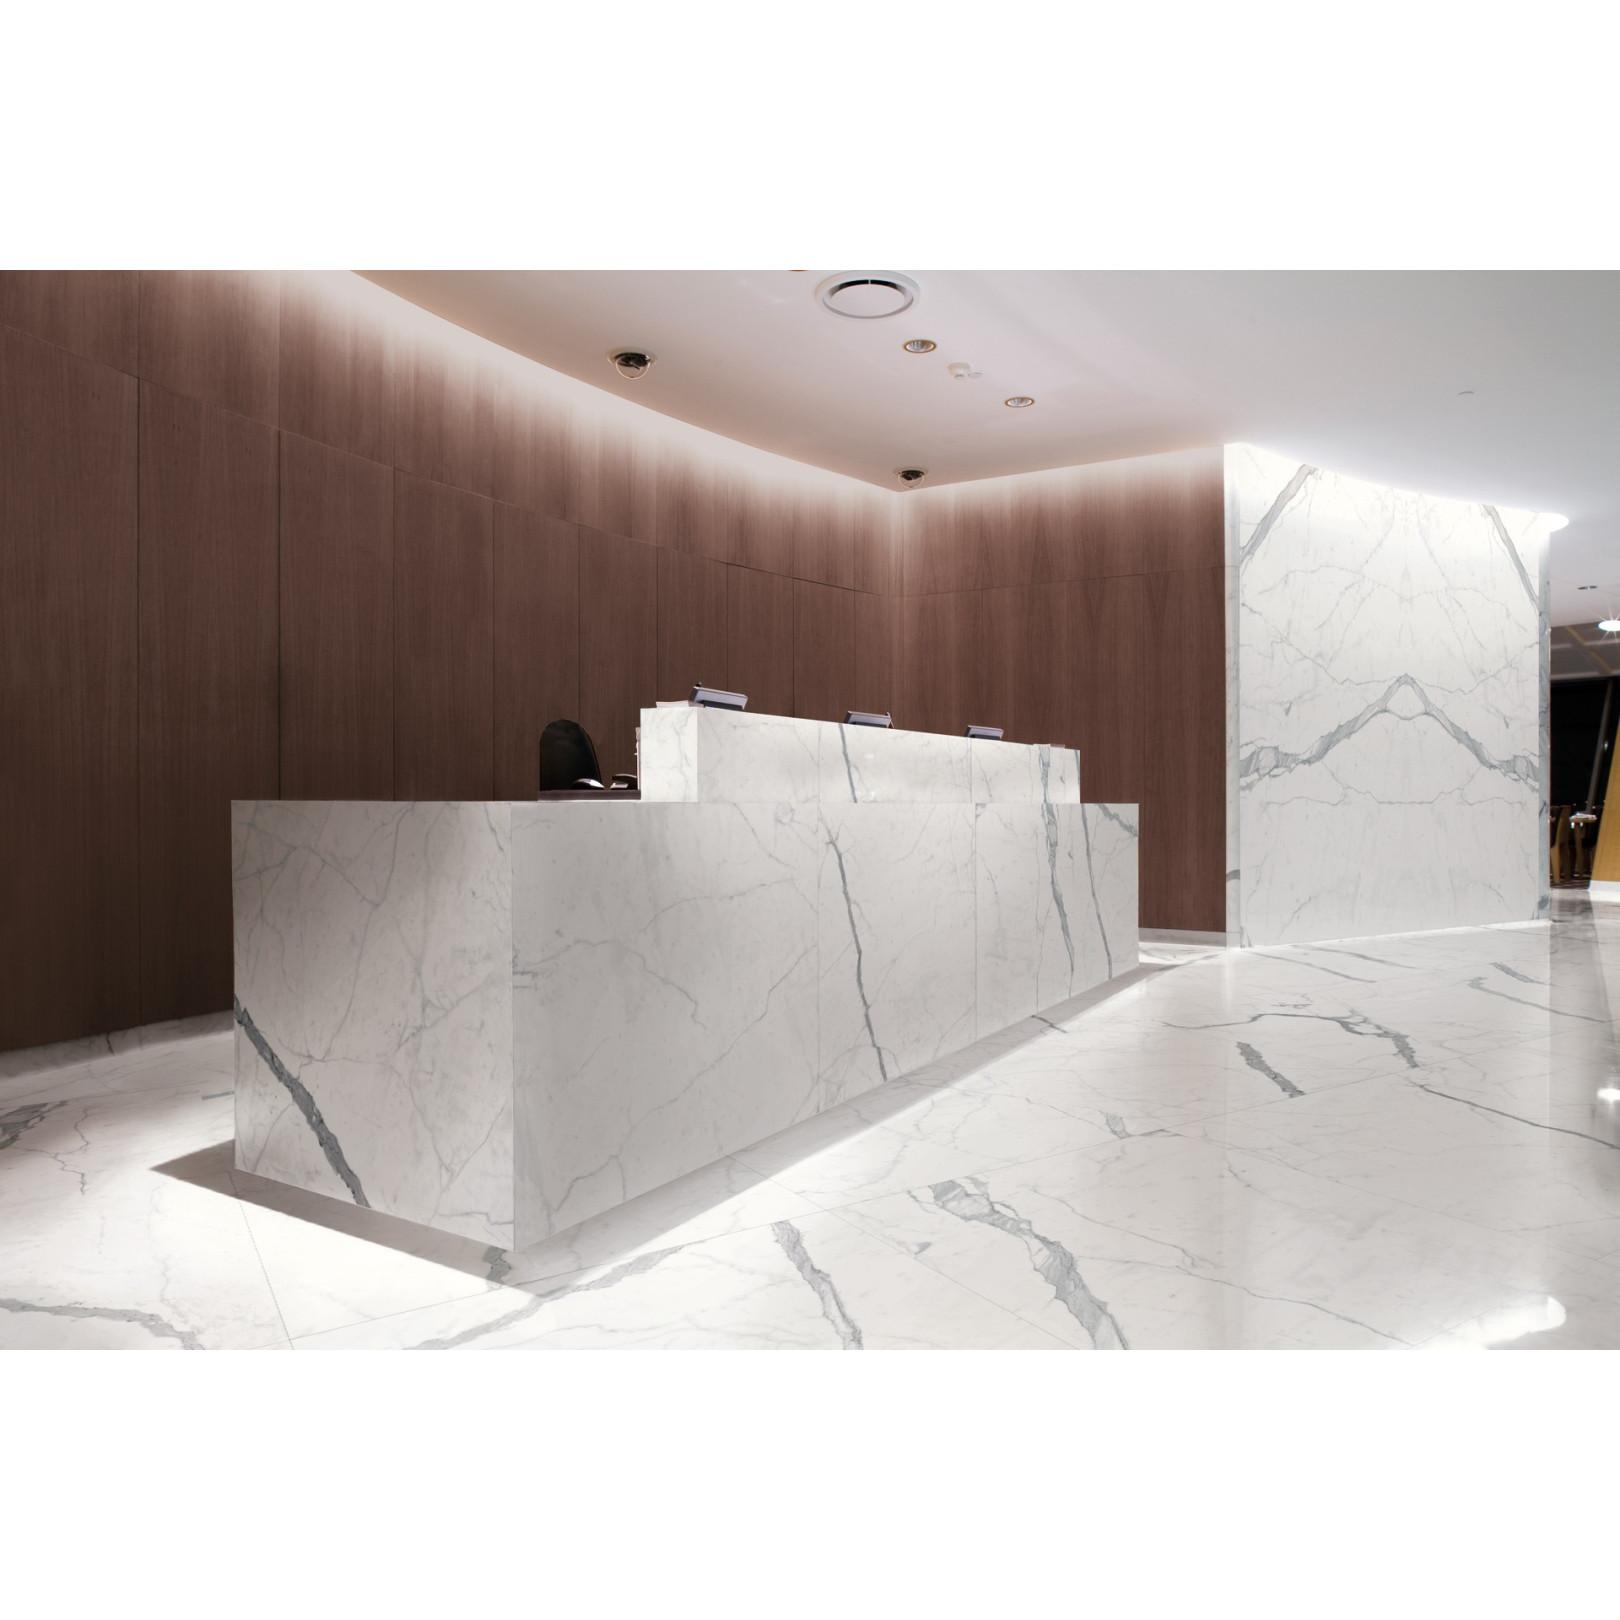 carrelage gr s c rame effet marbre mf bianco venato extra rectifi casalux home design. Black Bedroom Furniture Sets. Home Design Ideas